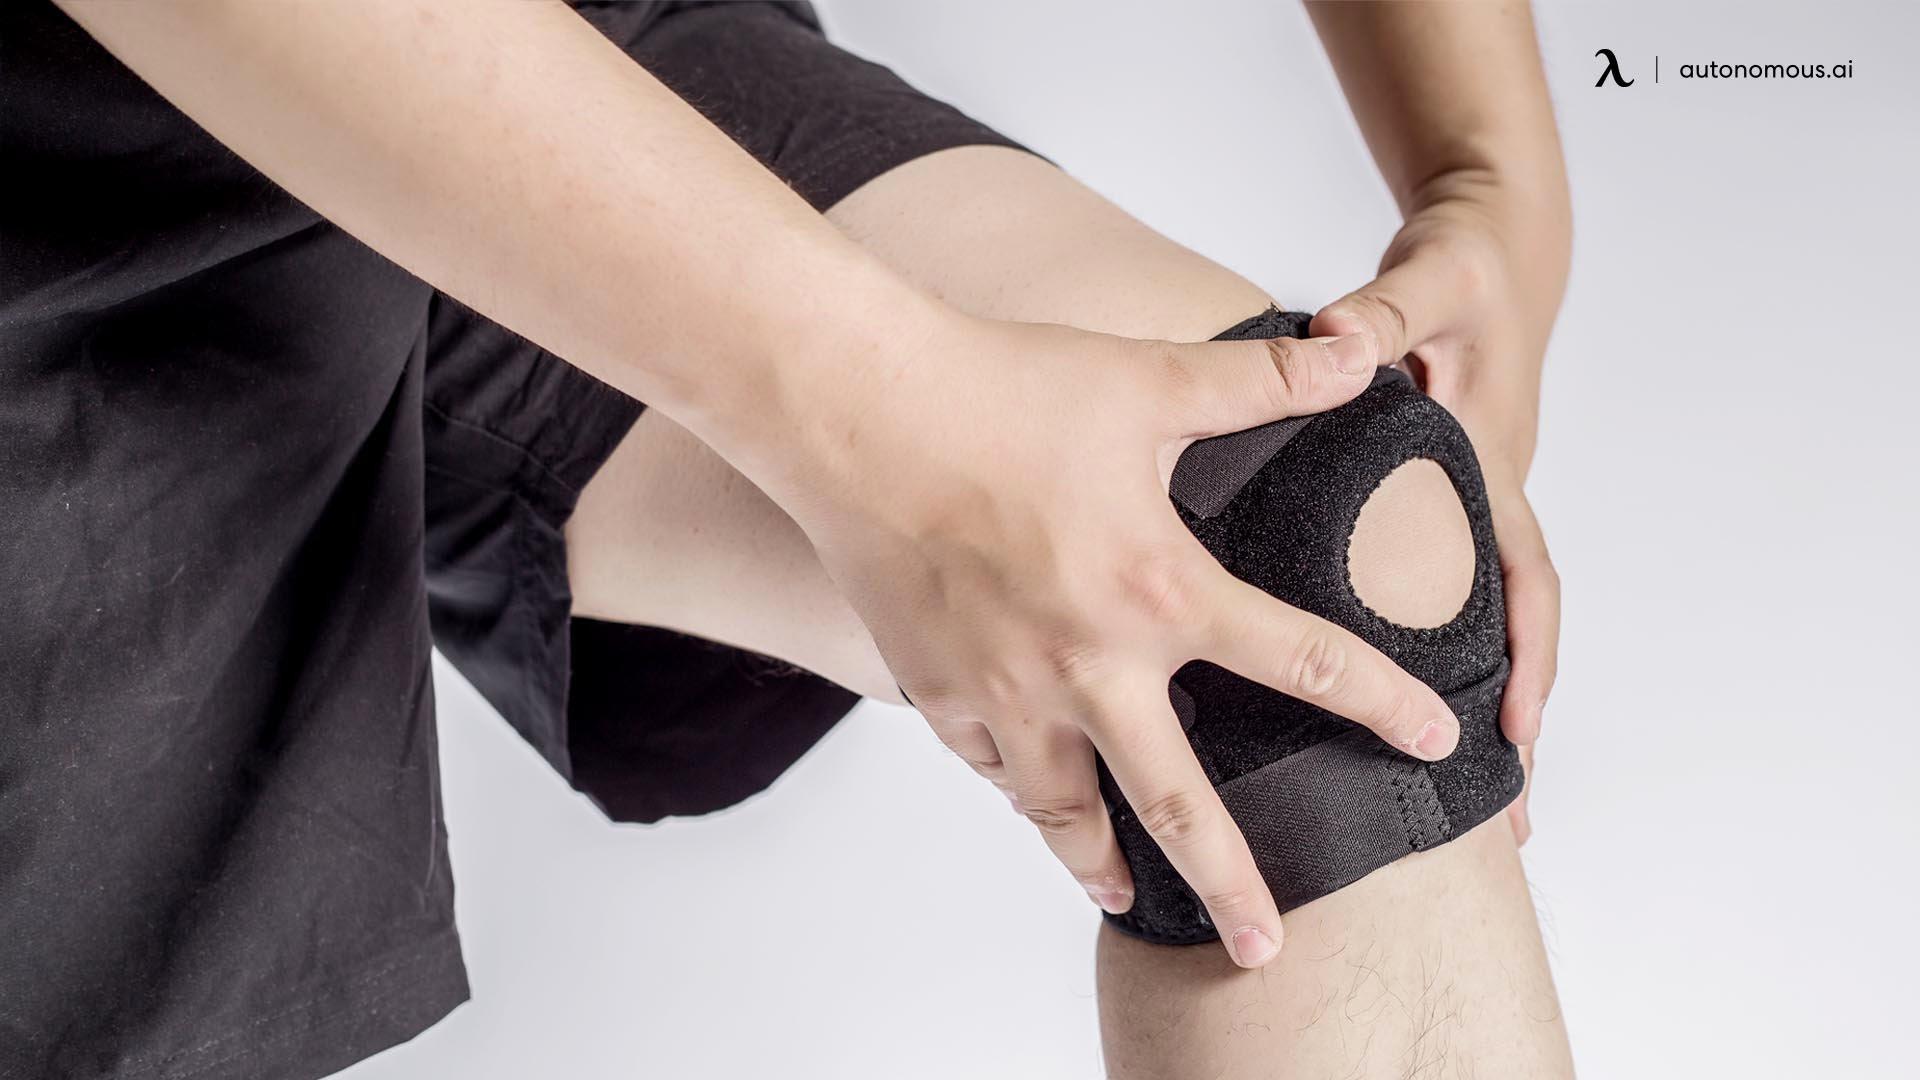 Anti-Fatigue Mats Help Joint Pain